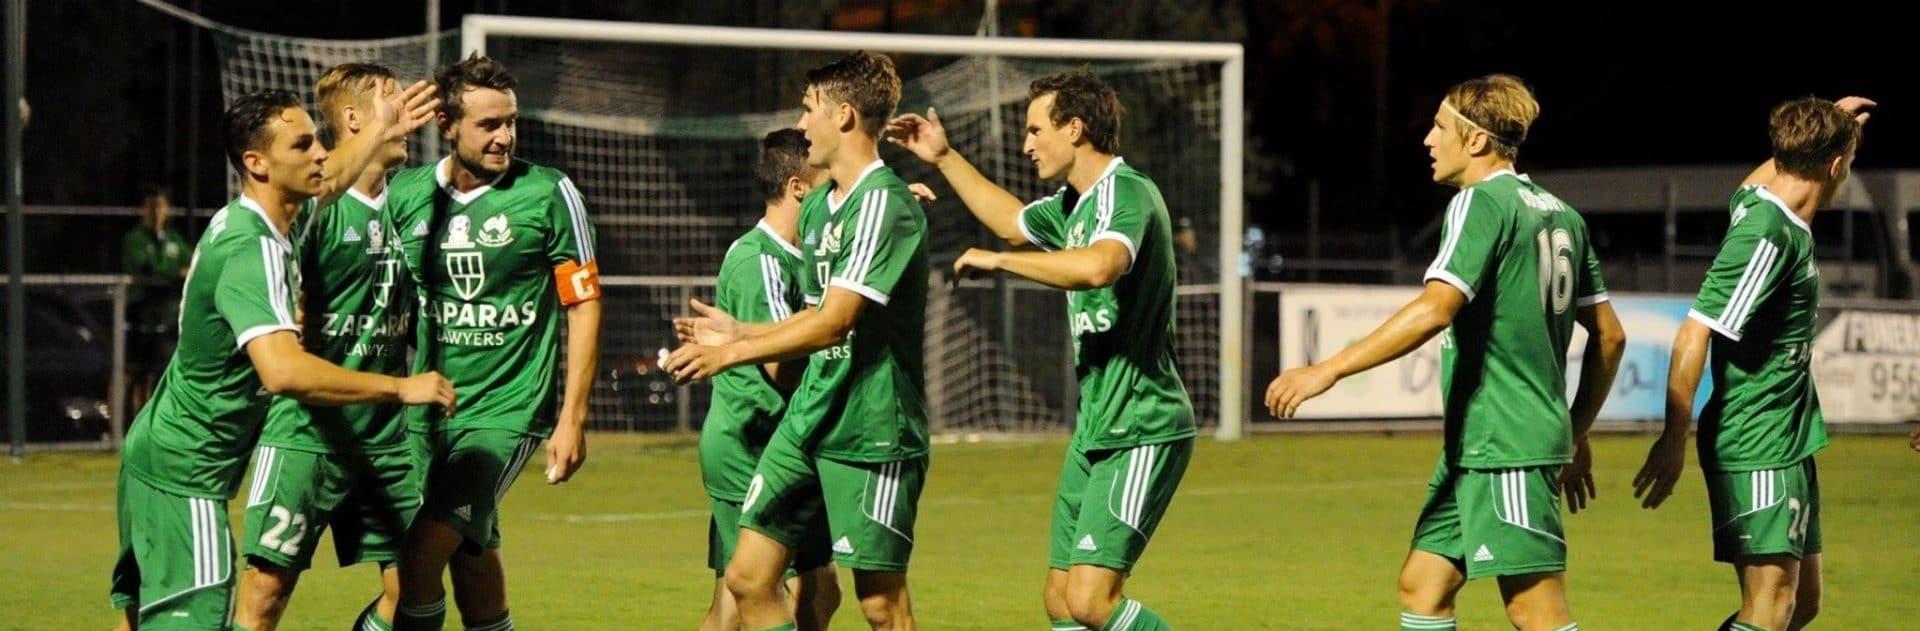 Bentleigh Greens 6-1 Richmond at Kingston Heath on Friday Night.